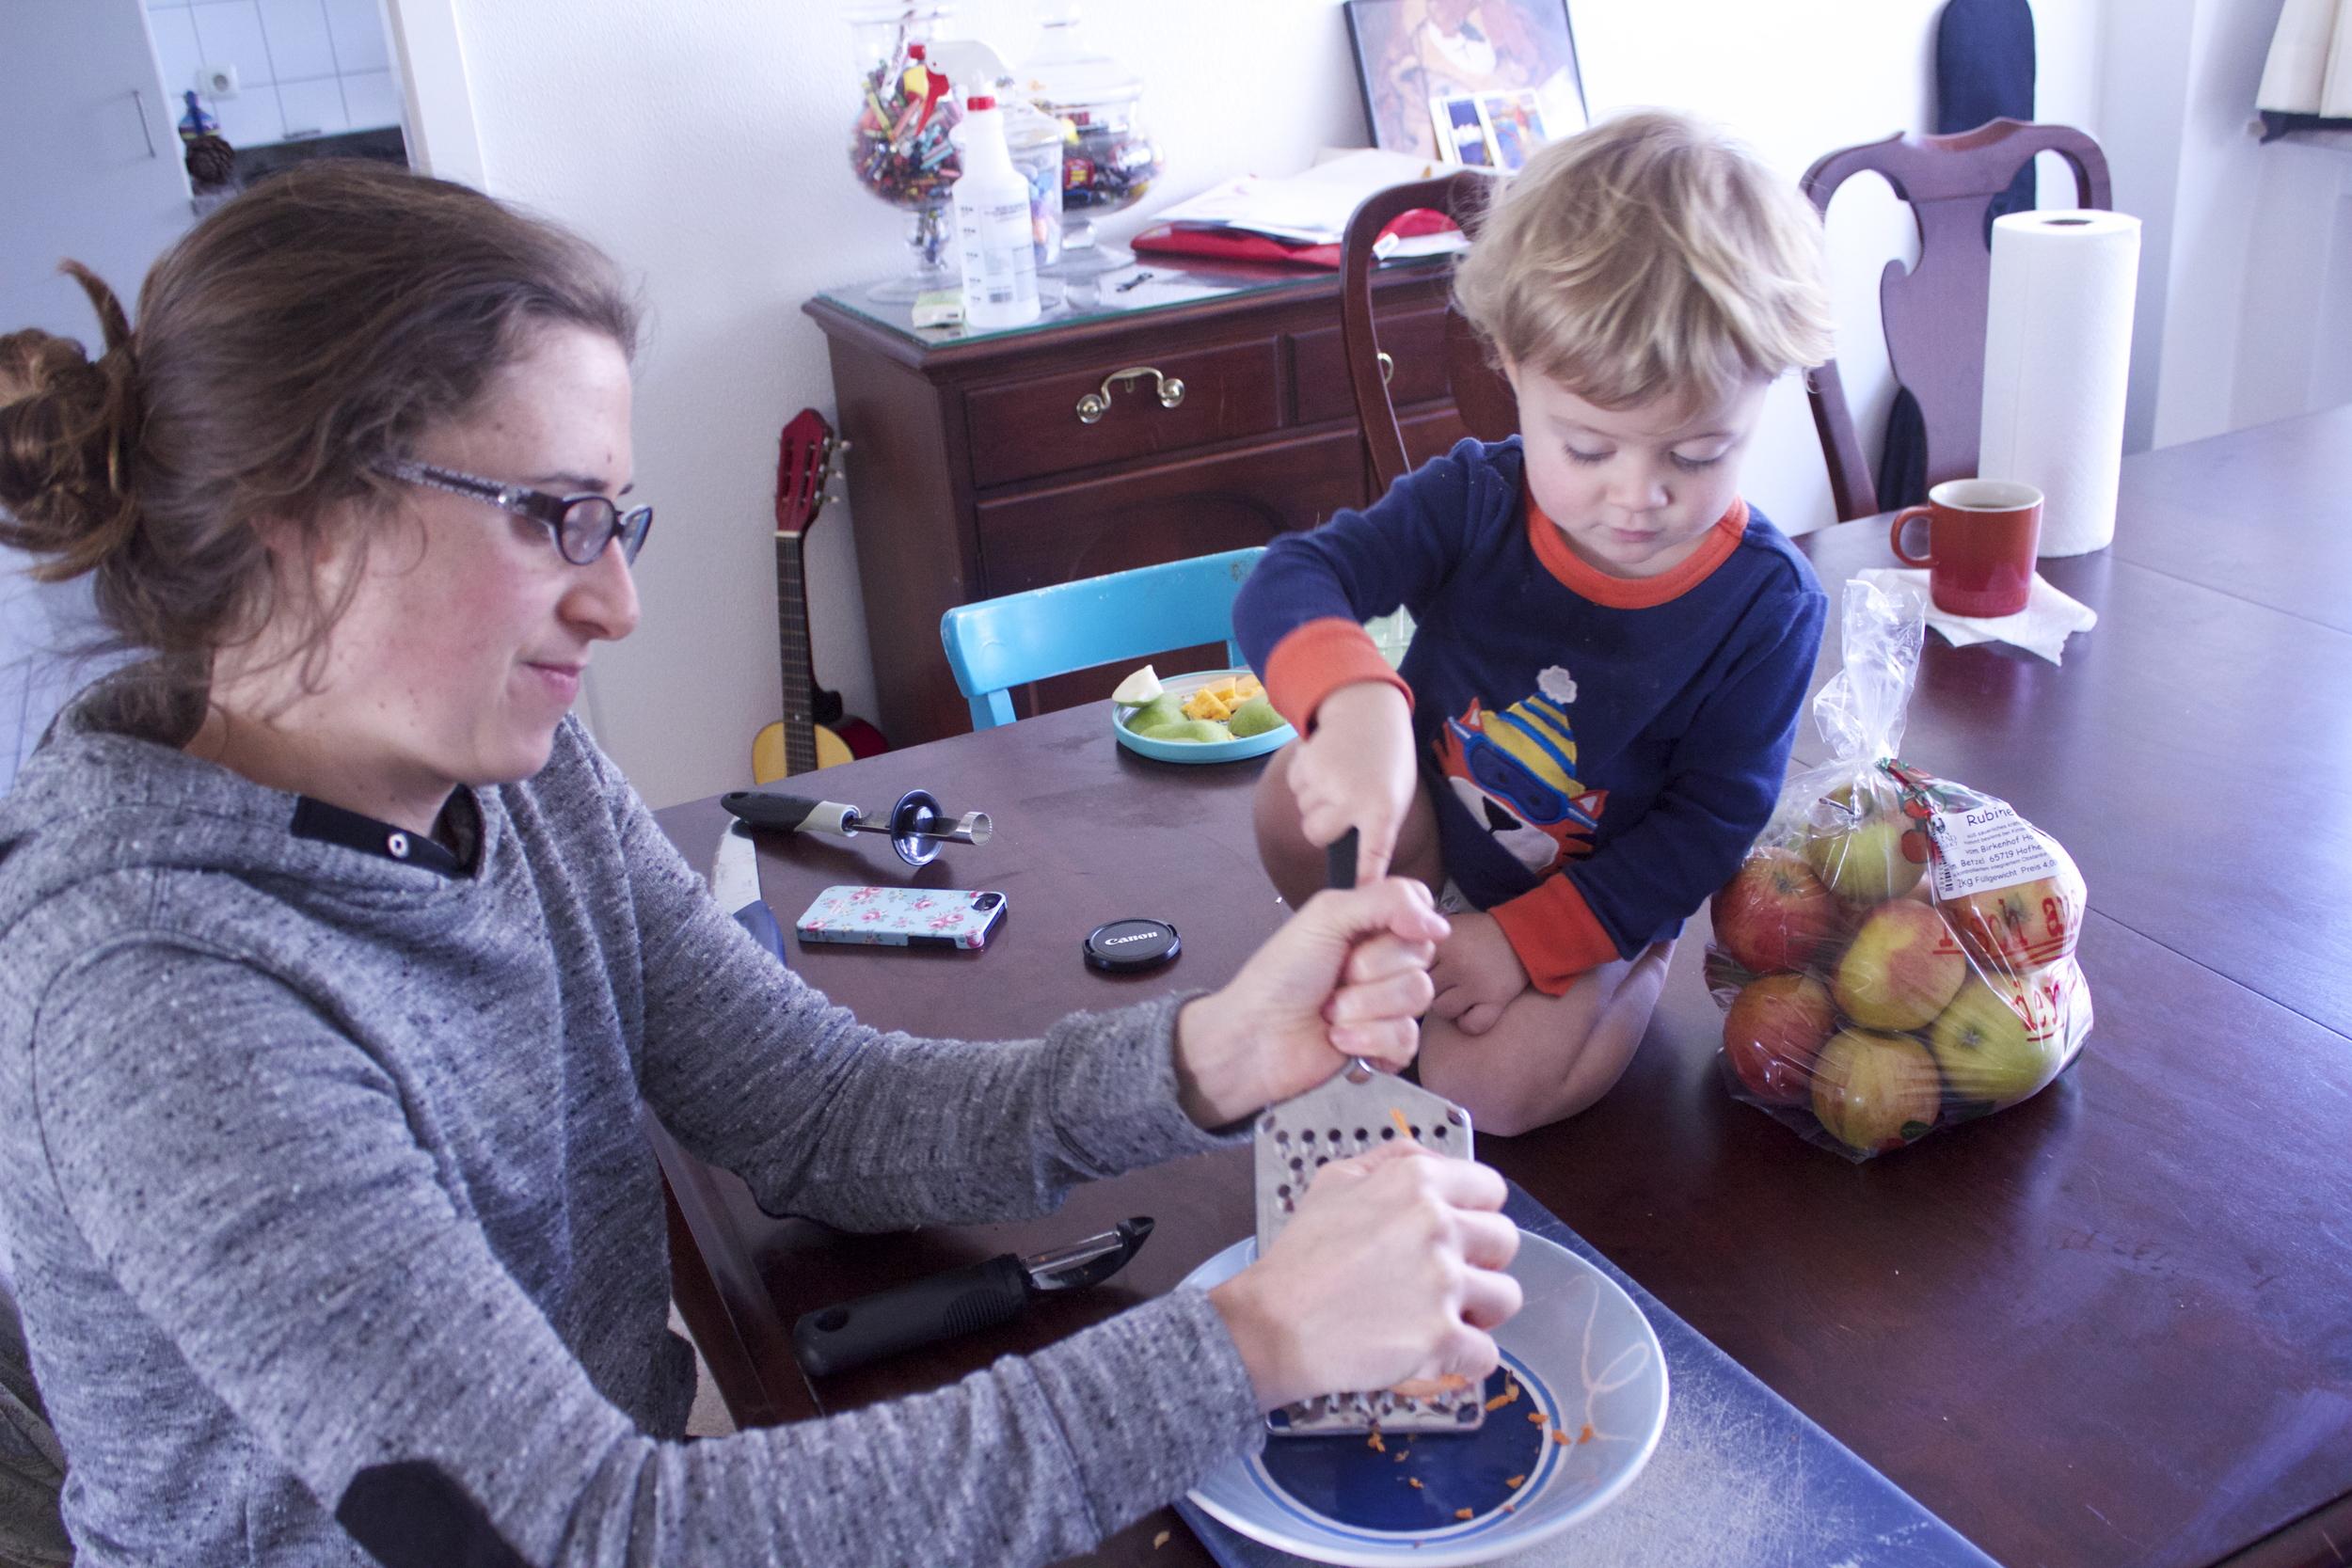 Potato shredding with baby supervision.